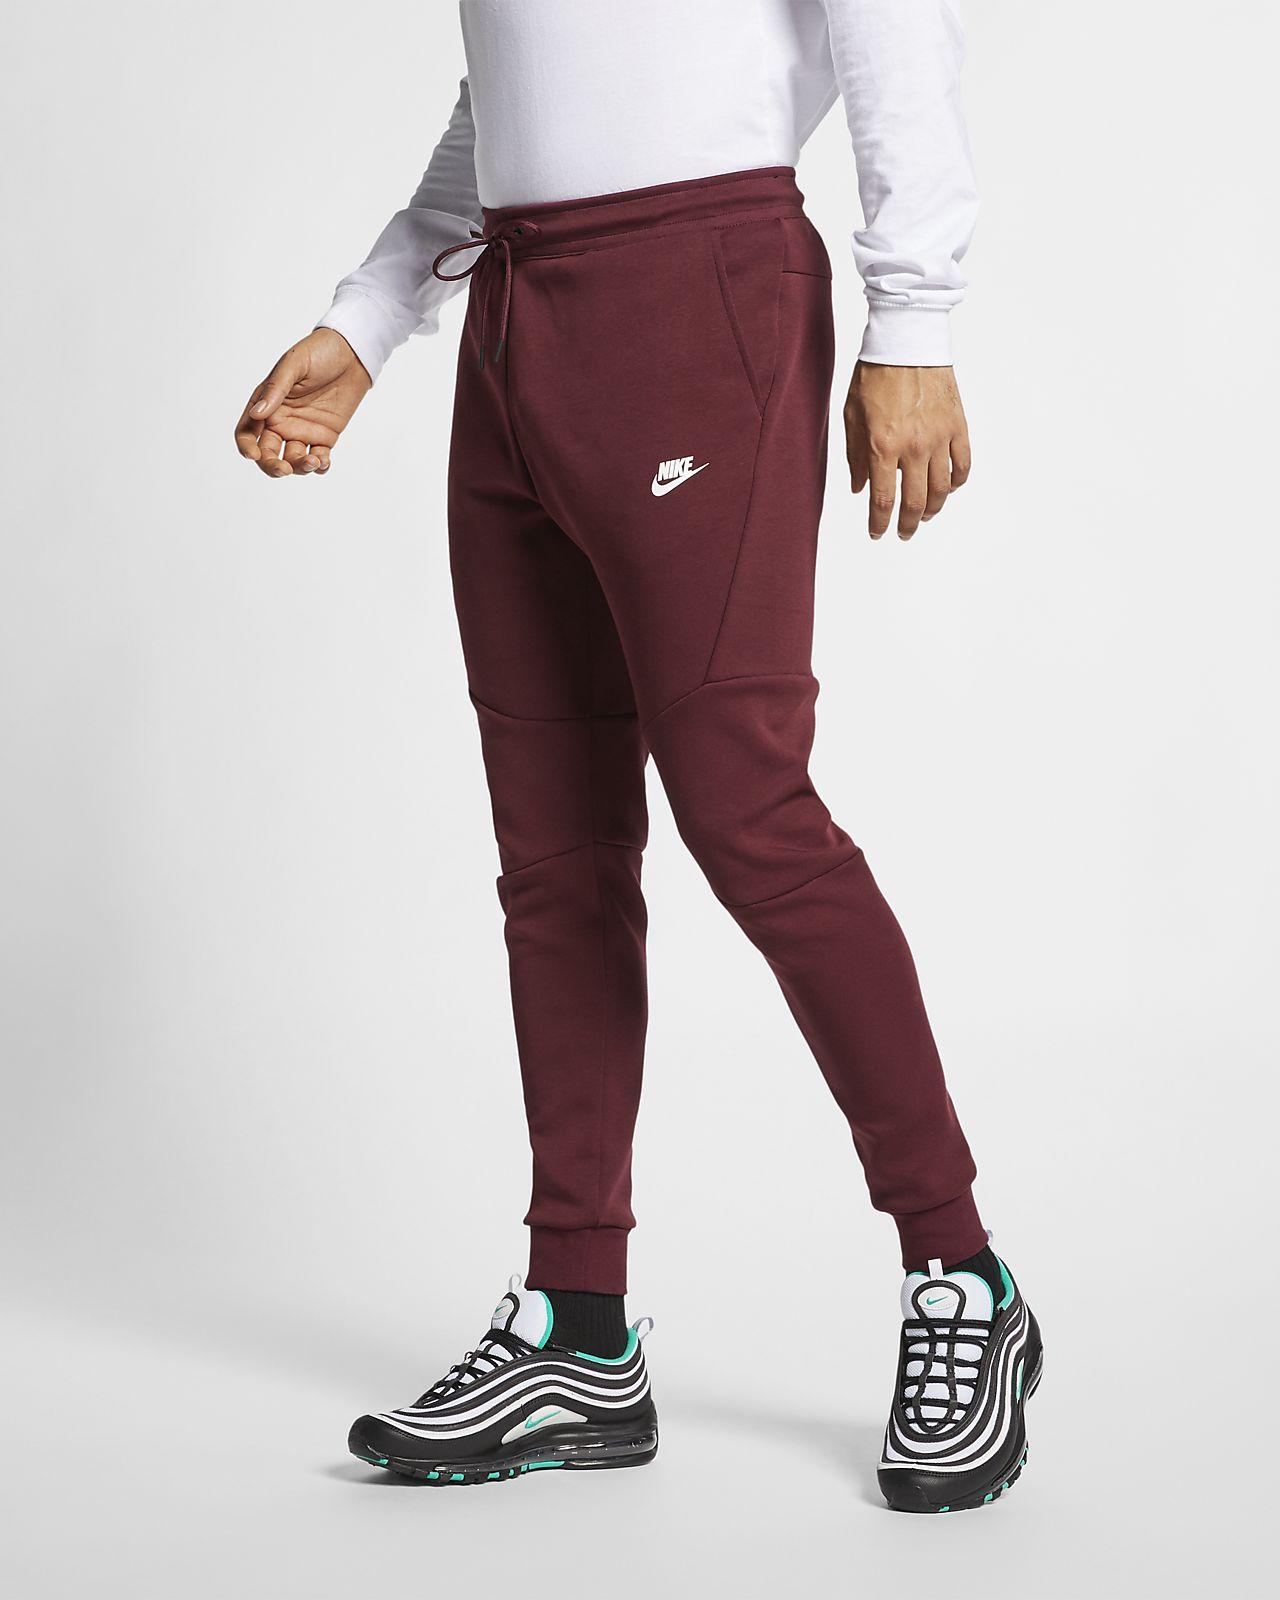 cheap for discount ef323 0e2fd Nike Sportswear Tech Fleece Men's Joggers